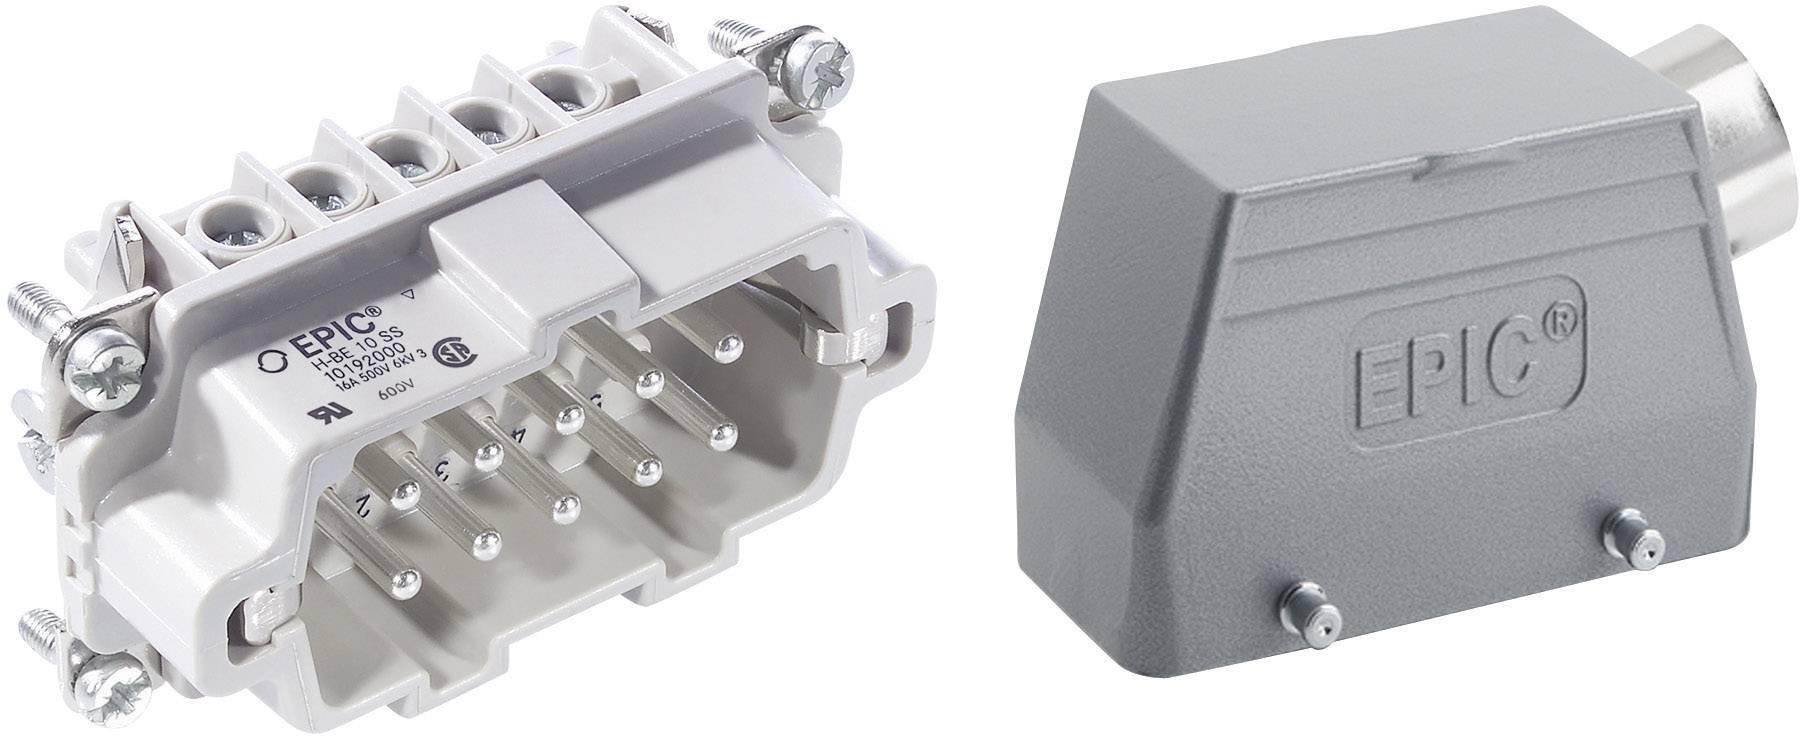 Sada konektorů EPIC®KIT H-BE 10 75009641 LAPP 10 + PE šroubovací 1 sada